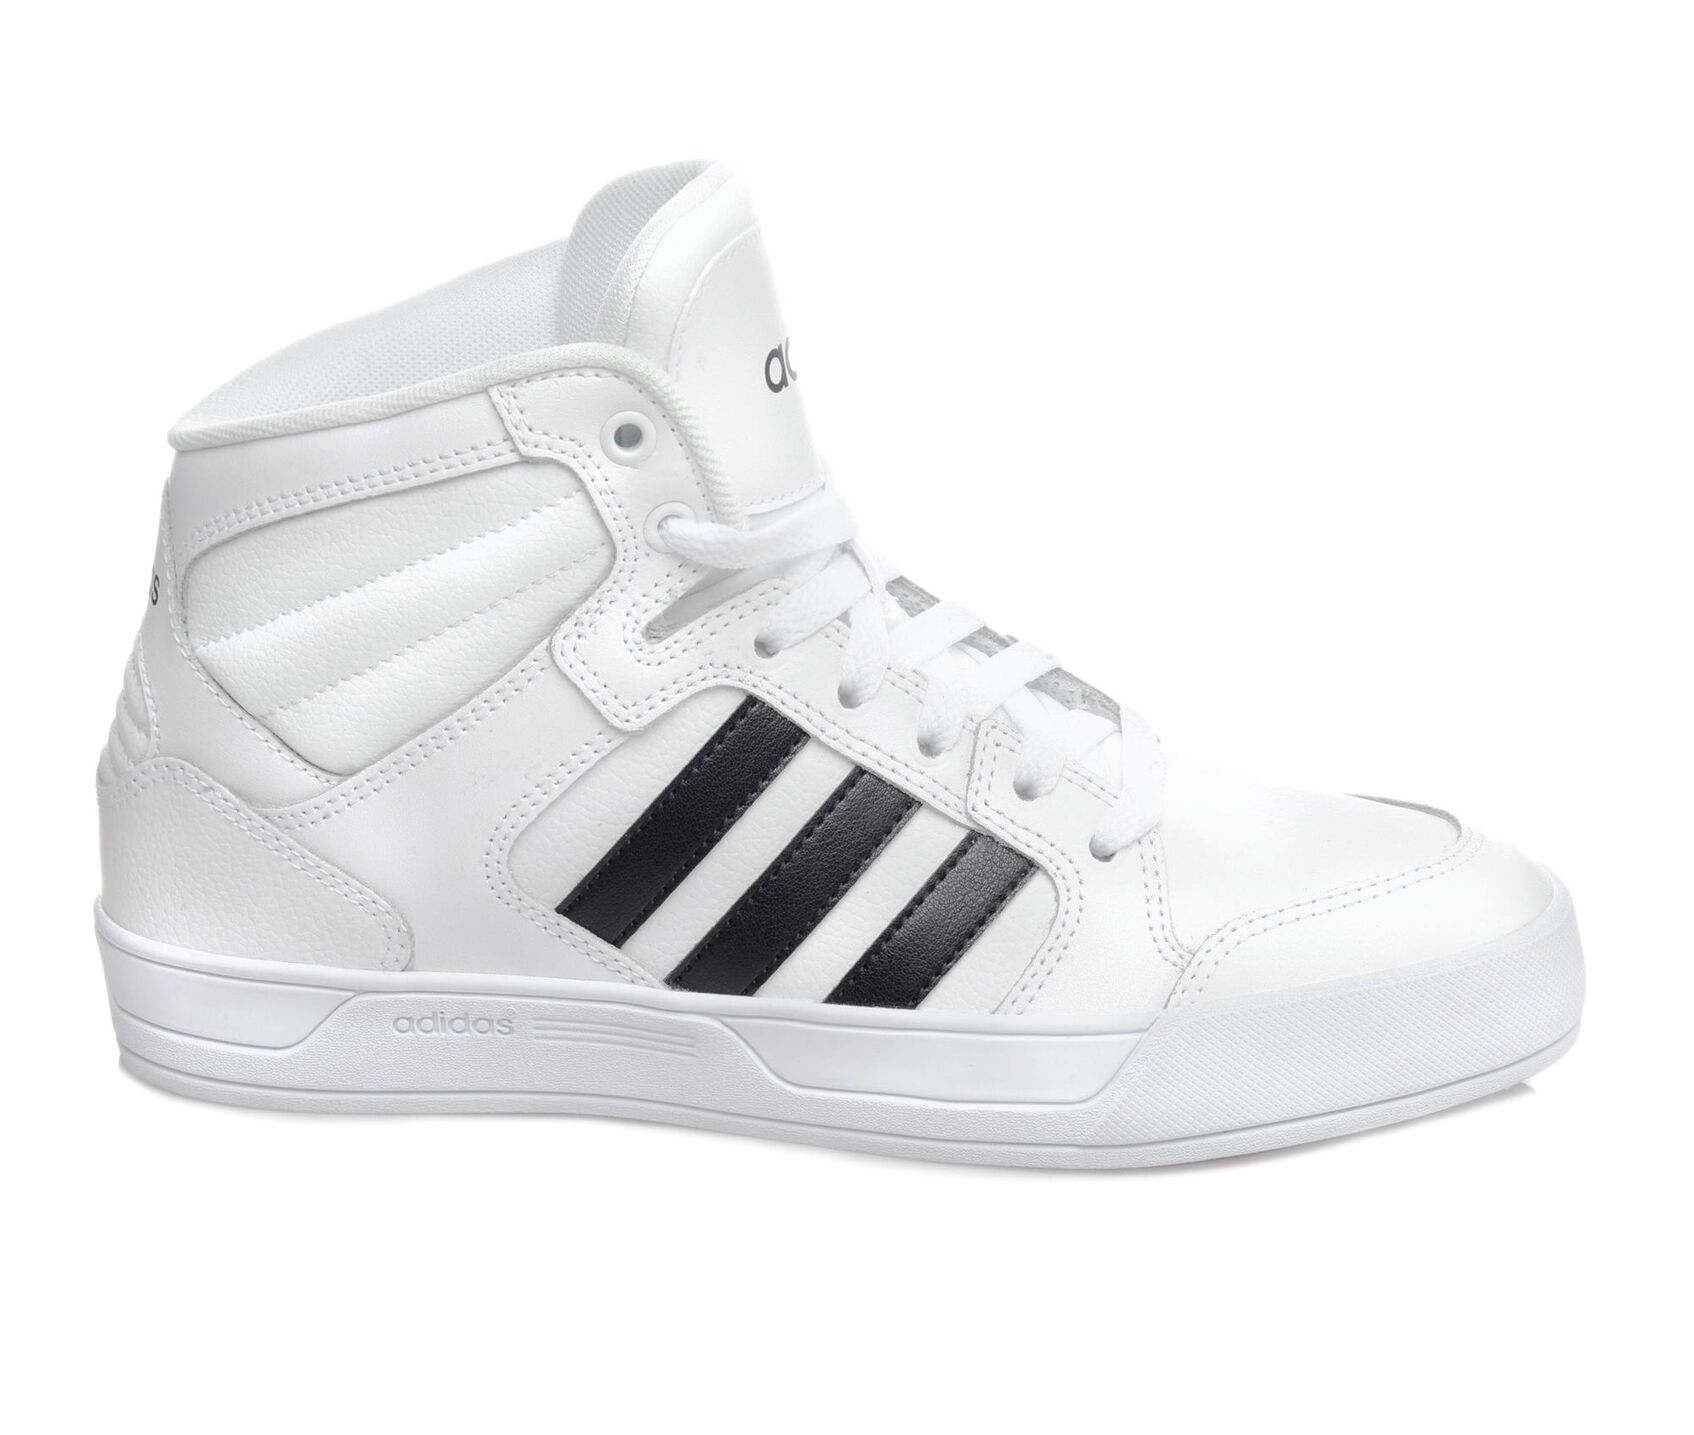 adidas basketball shoes womens. adidas basketball shoes womens